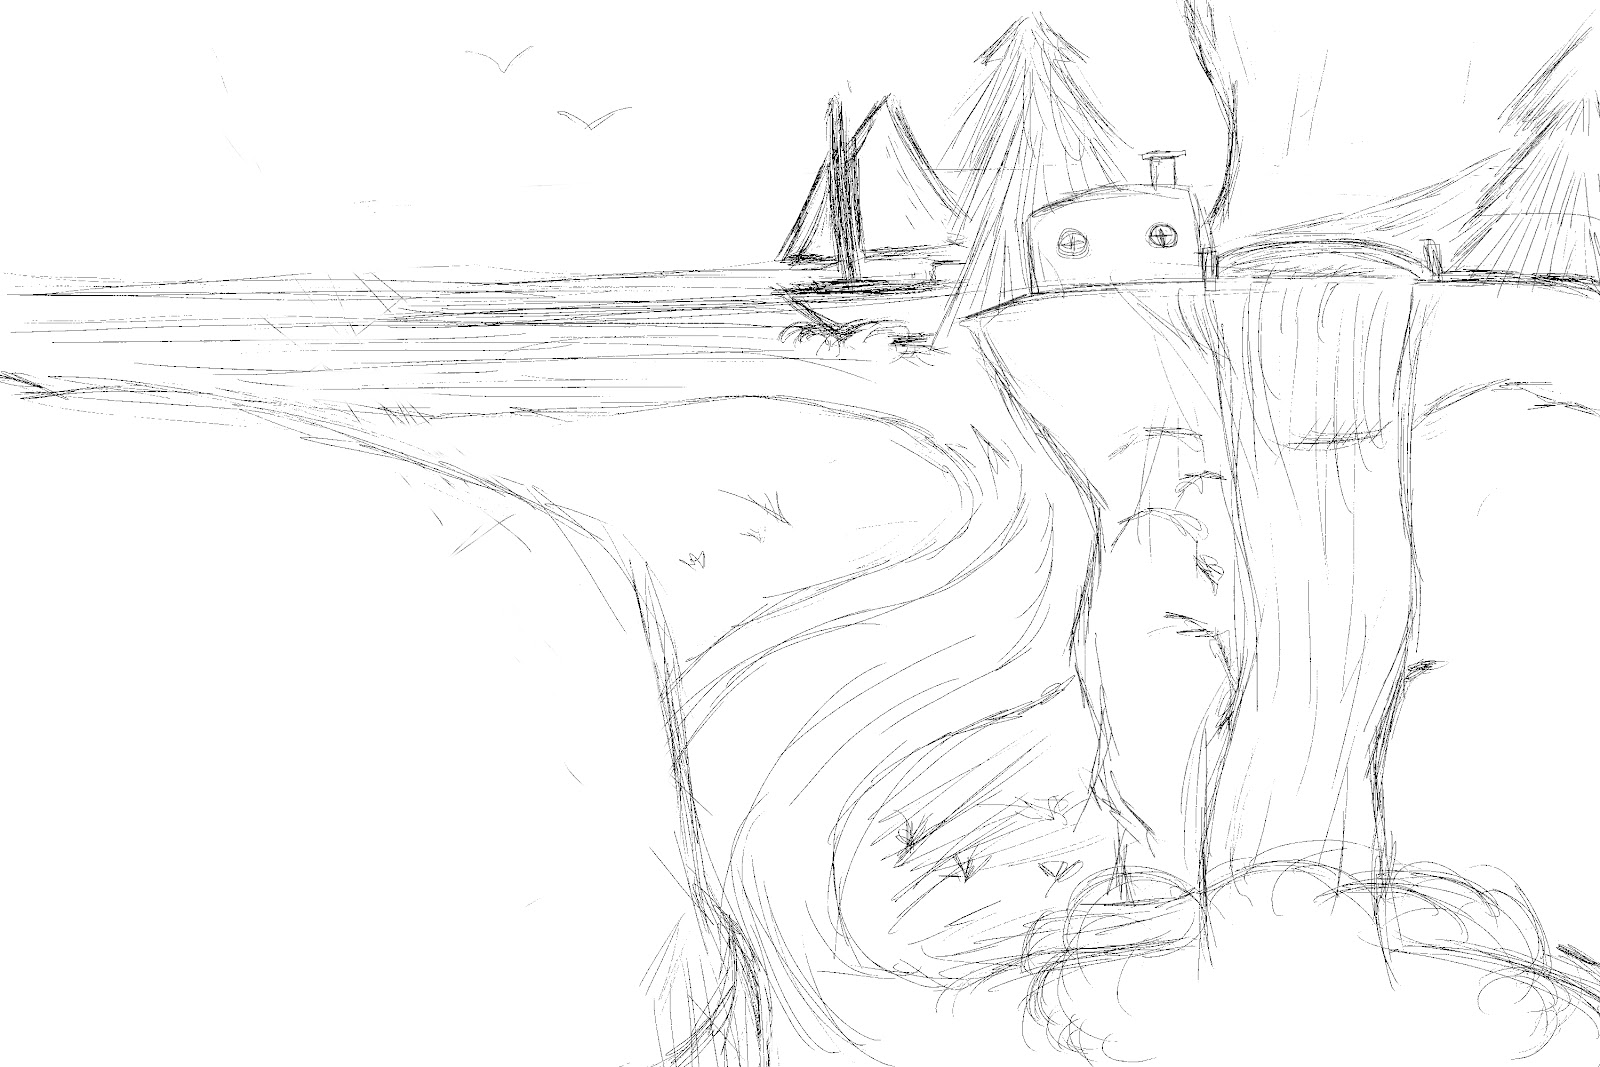 Drawn cilff landscape Landscape already of I was